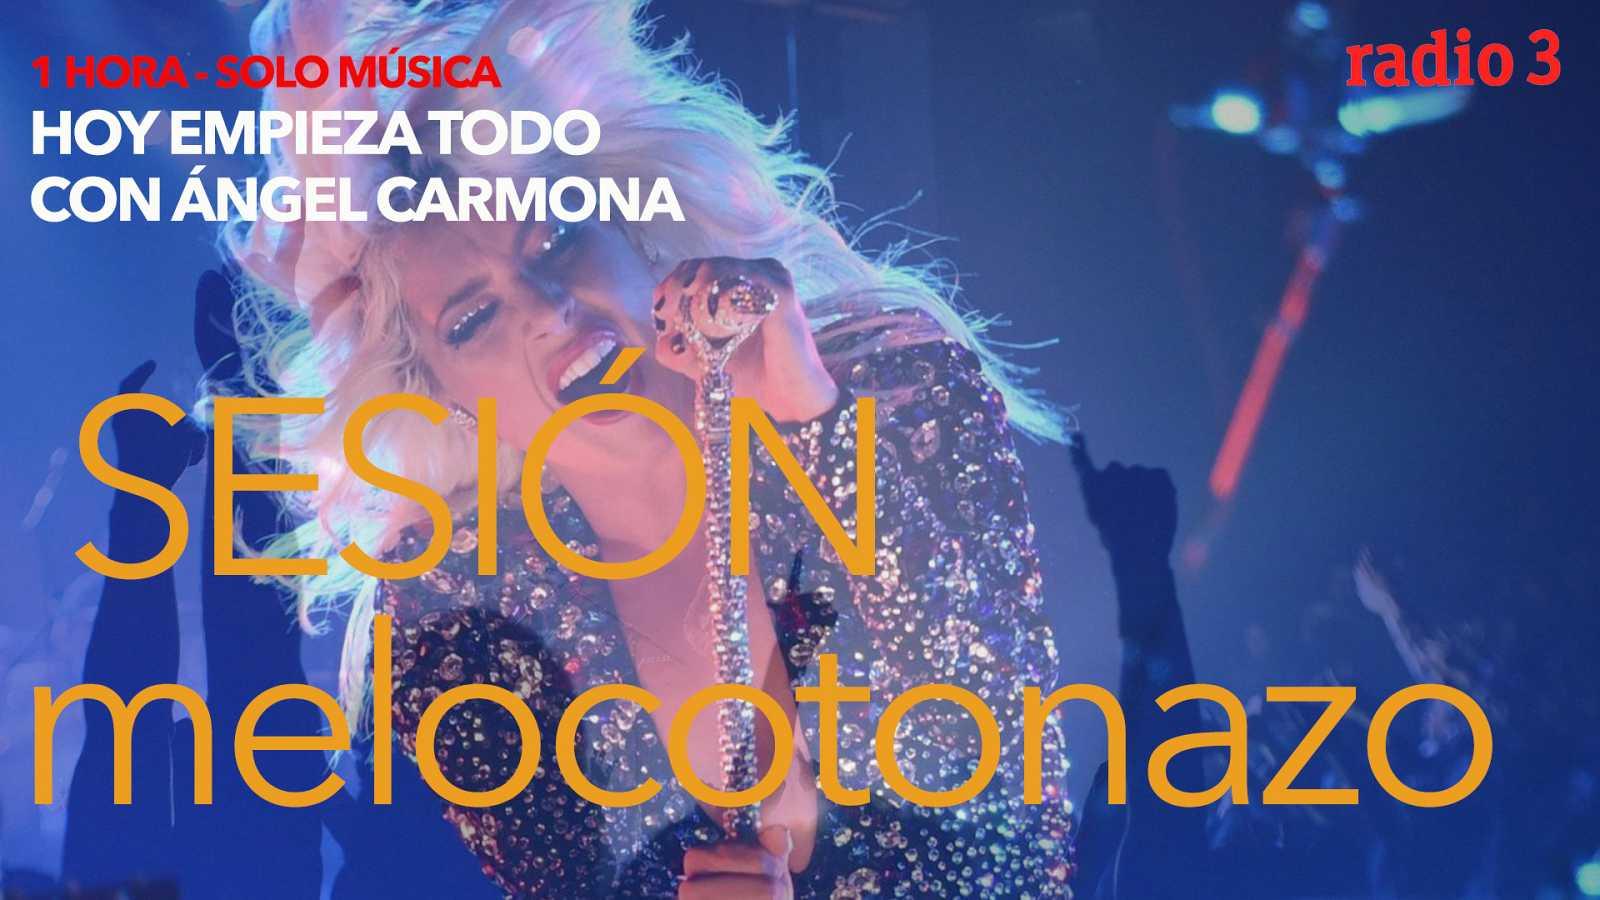 Hoy empieza todo con Ángel Carmona - #SesiónMelocotonazo: Daniel Johnston, Lady Gaga, Pizzicato five... - 22/01/21 - escuchar ahora